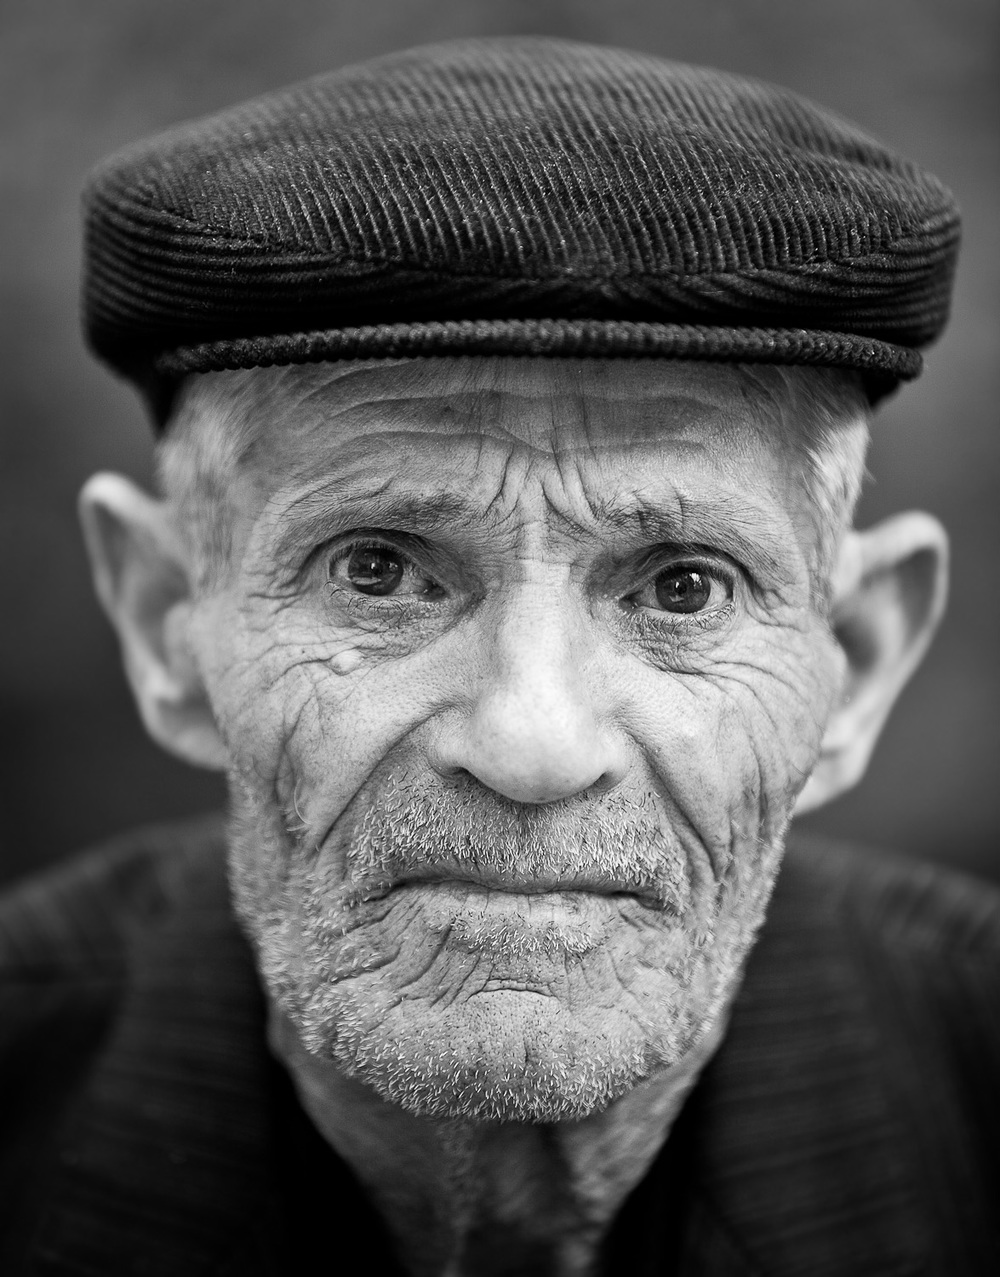 Black white portraits of old men alk3r